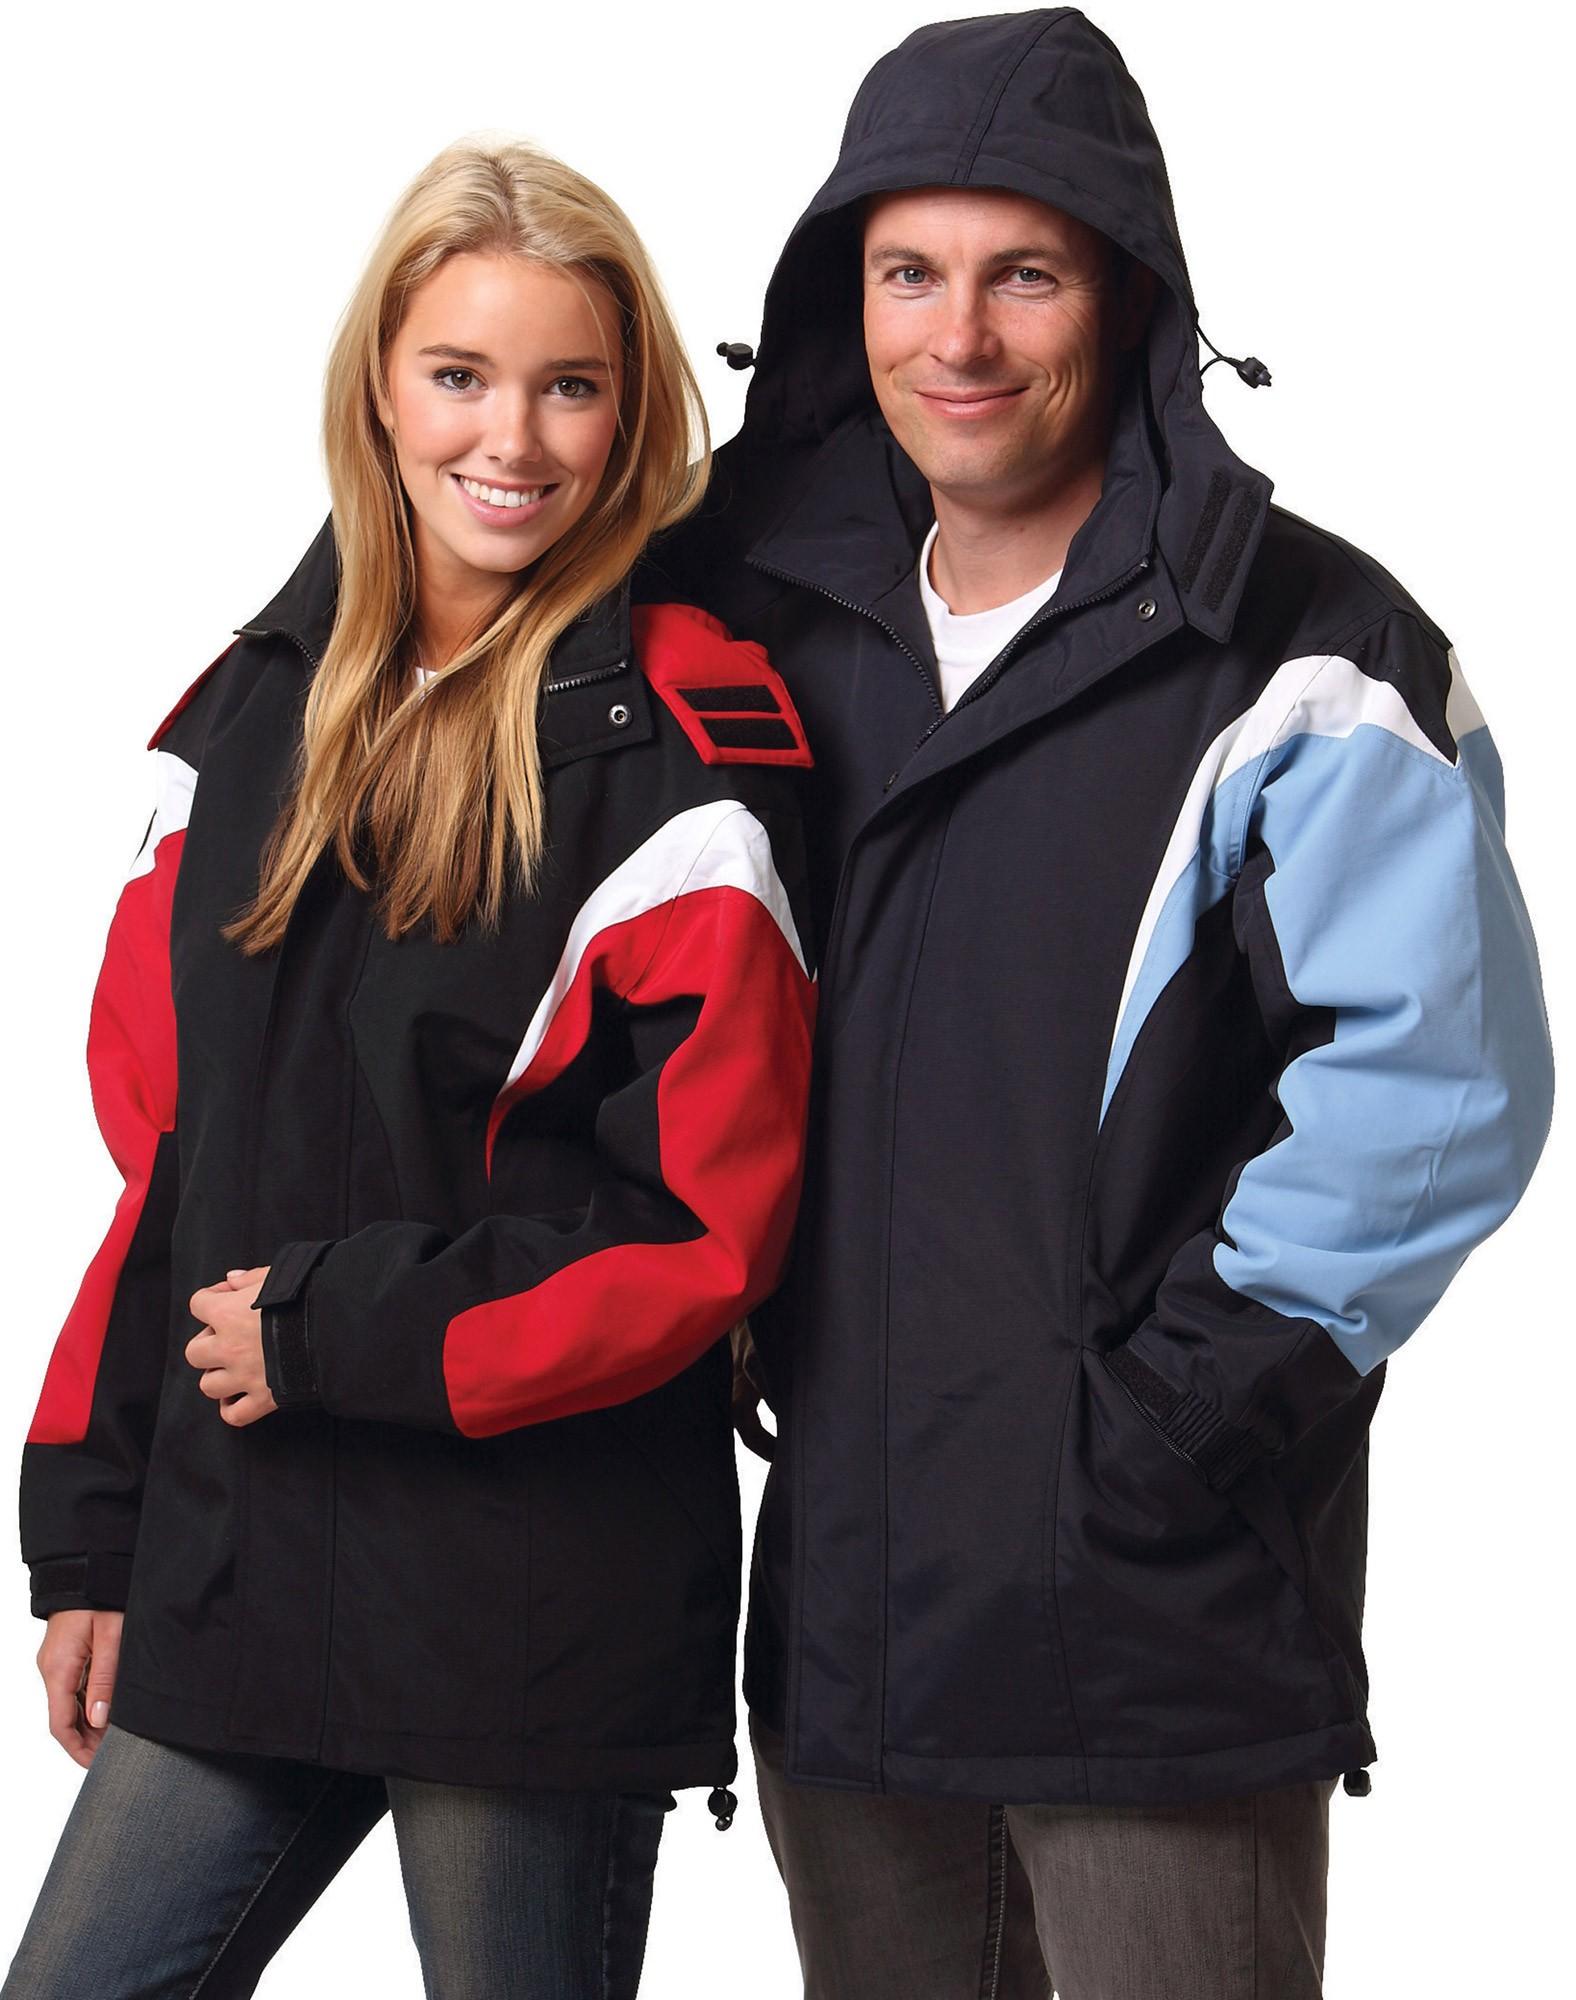 Unisex Bathurst Tri-colour Jacket With Hood